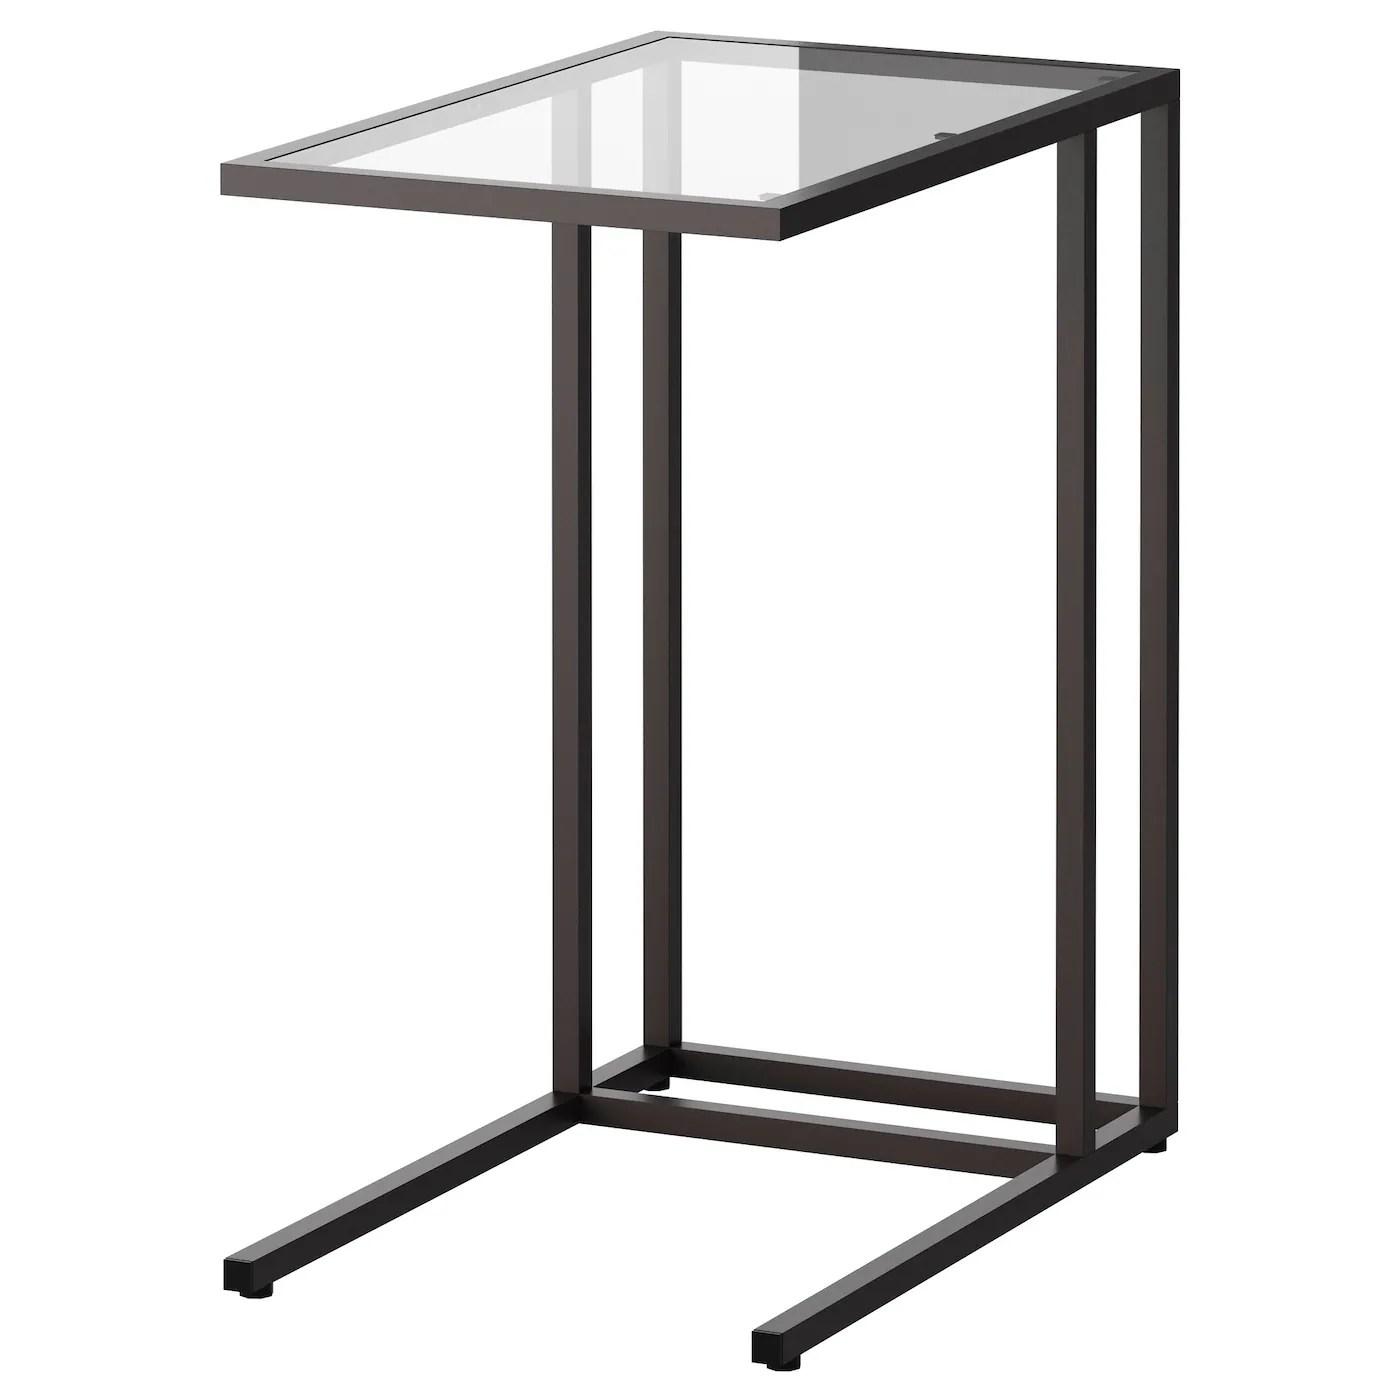 Vittsjo Laptop Stand Black Brown Glass 13 3 4x25 5 8 Ikea